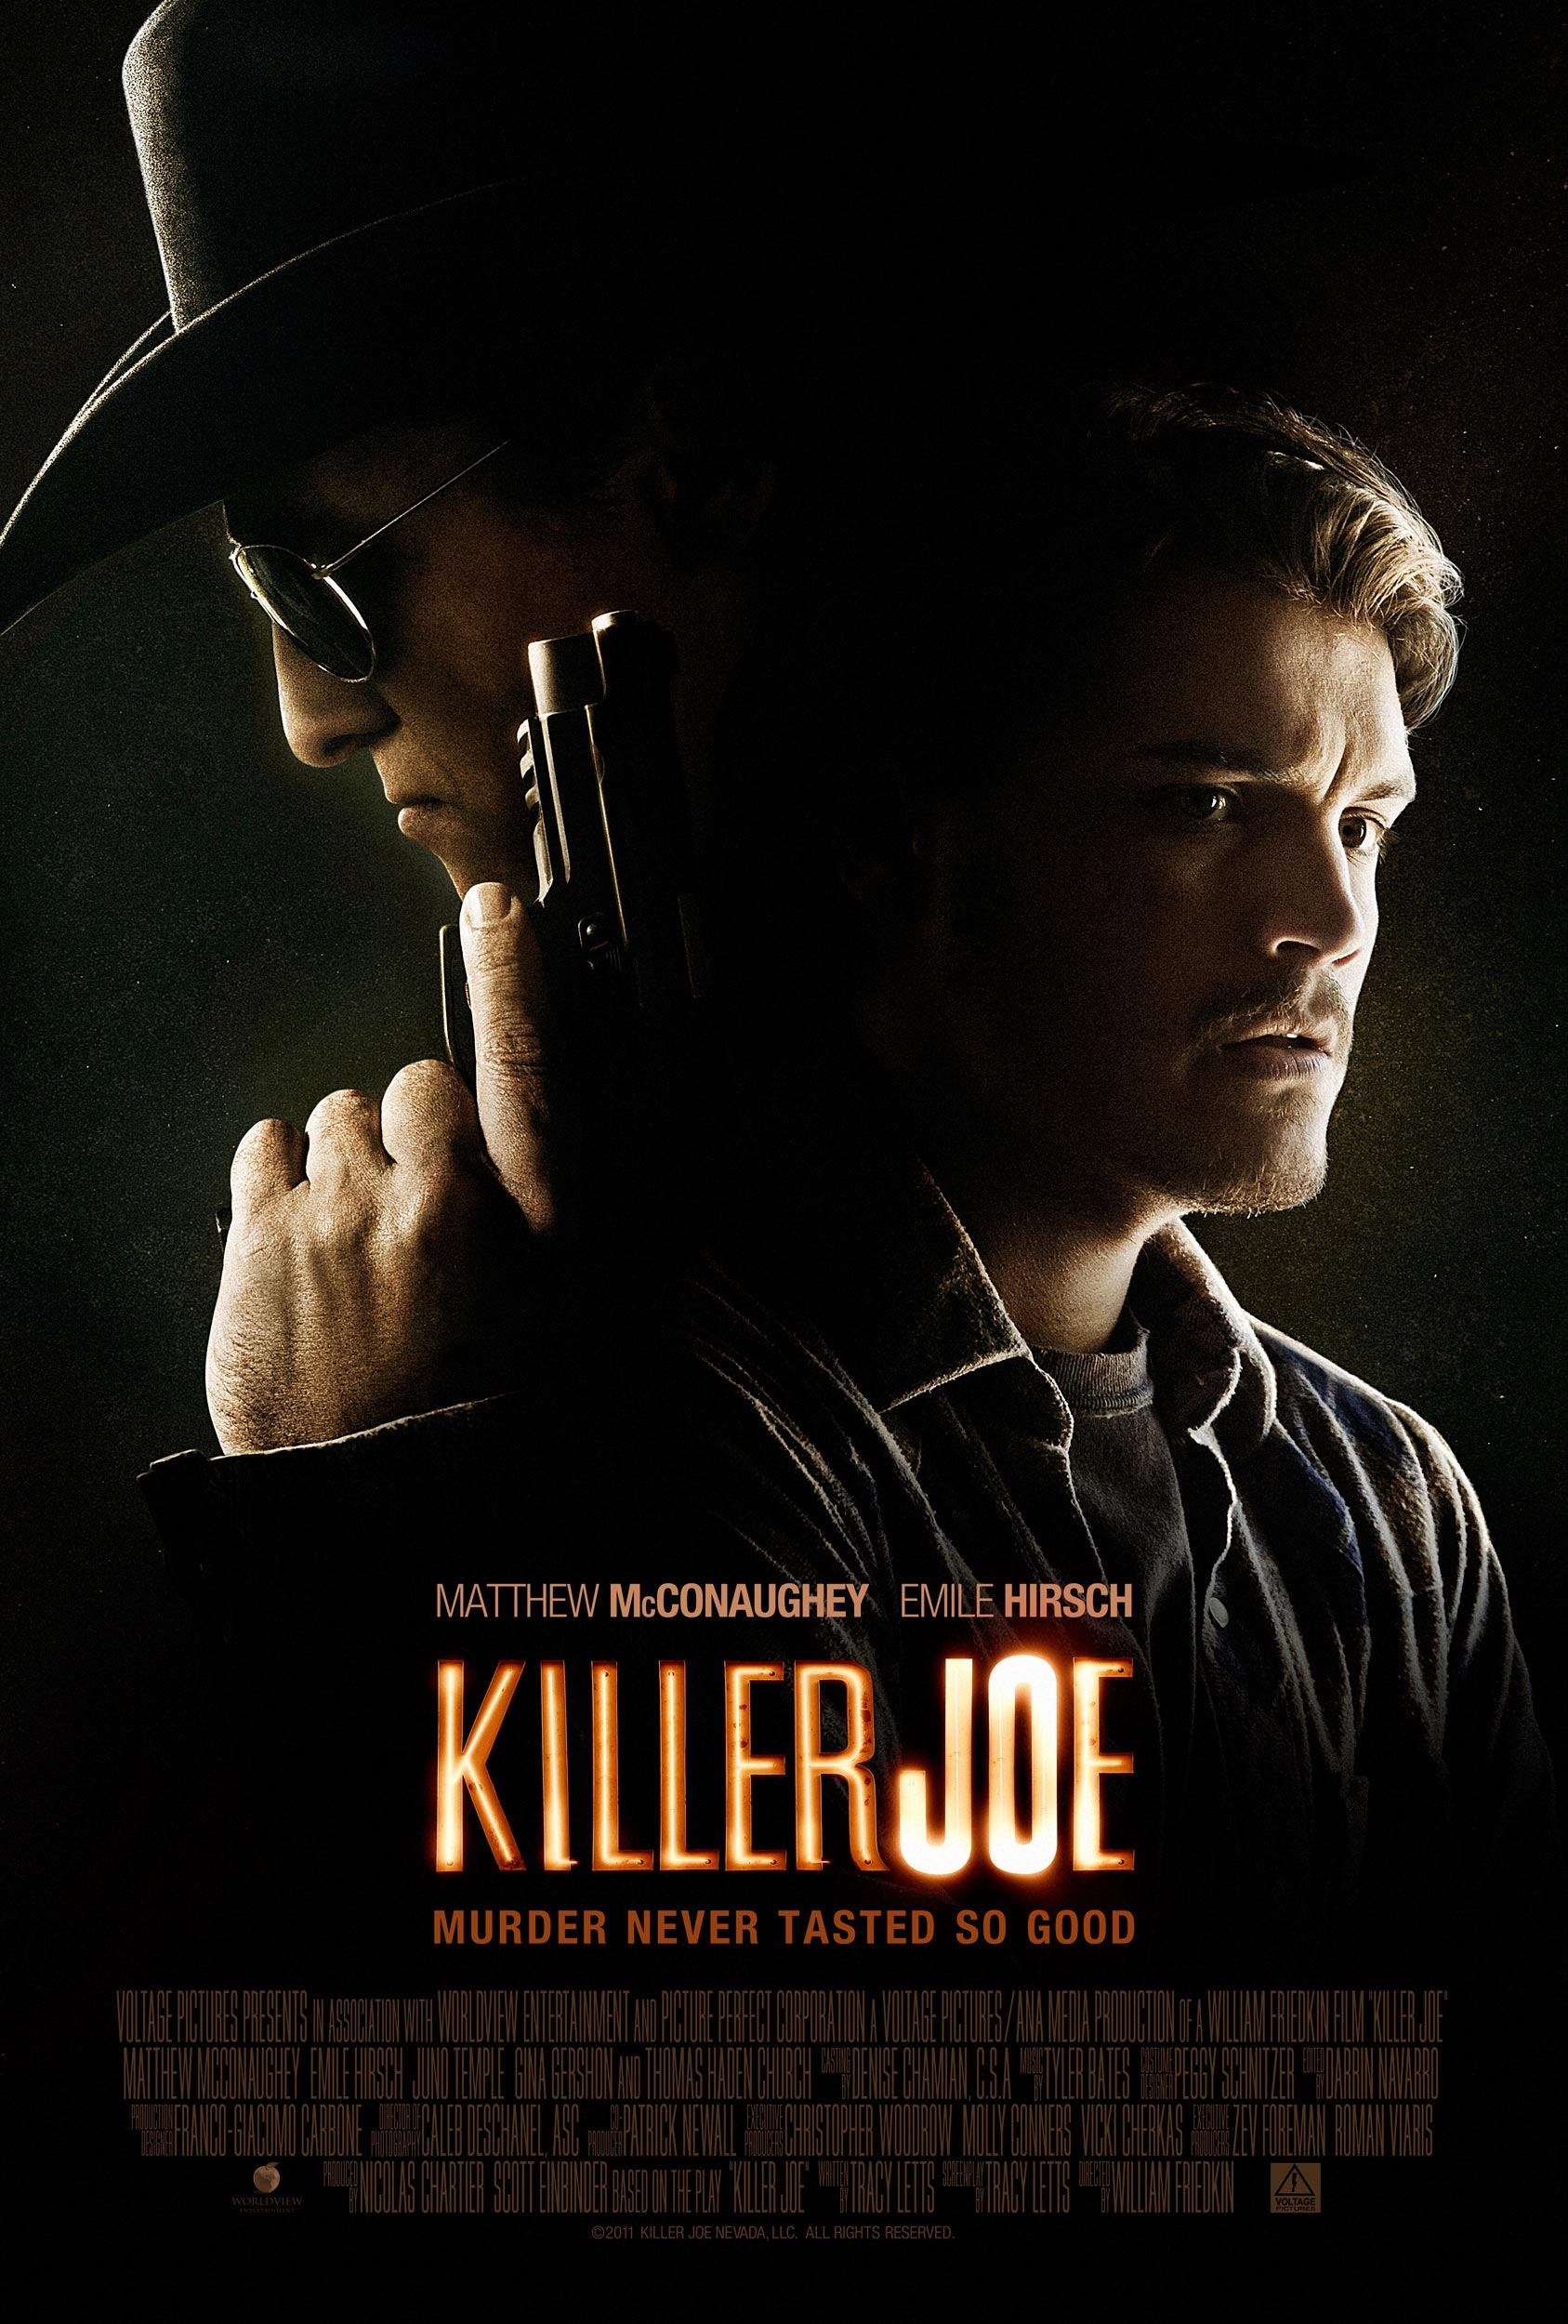 http://www.filmofilia.com/wp-content/uploads/2011/09/Killer_Joe_Onesheet_final.jpg